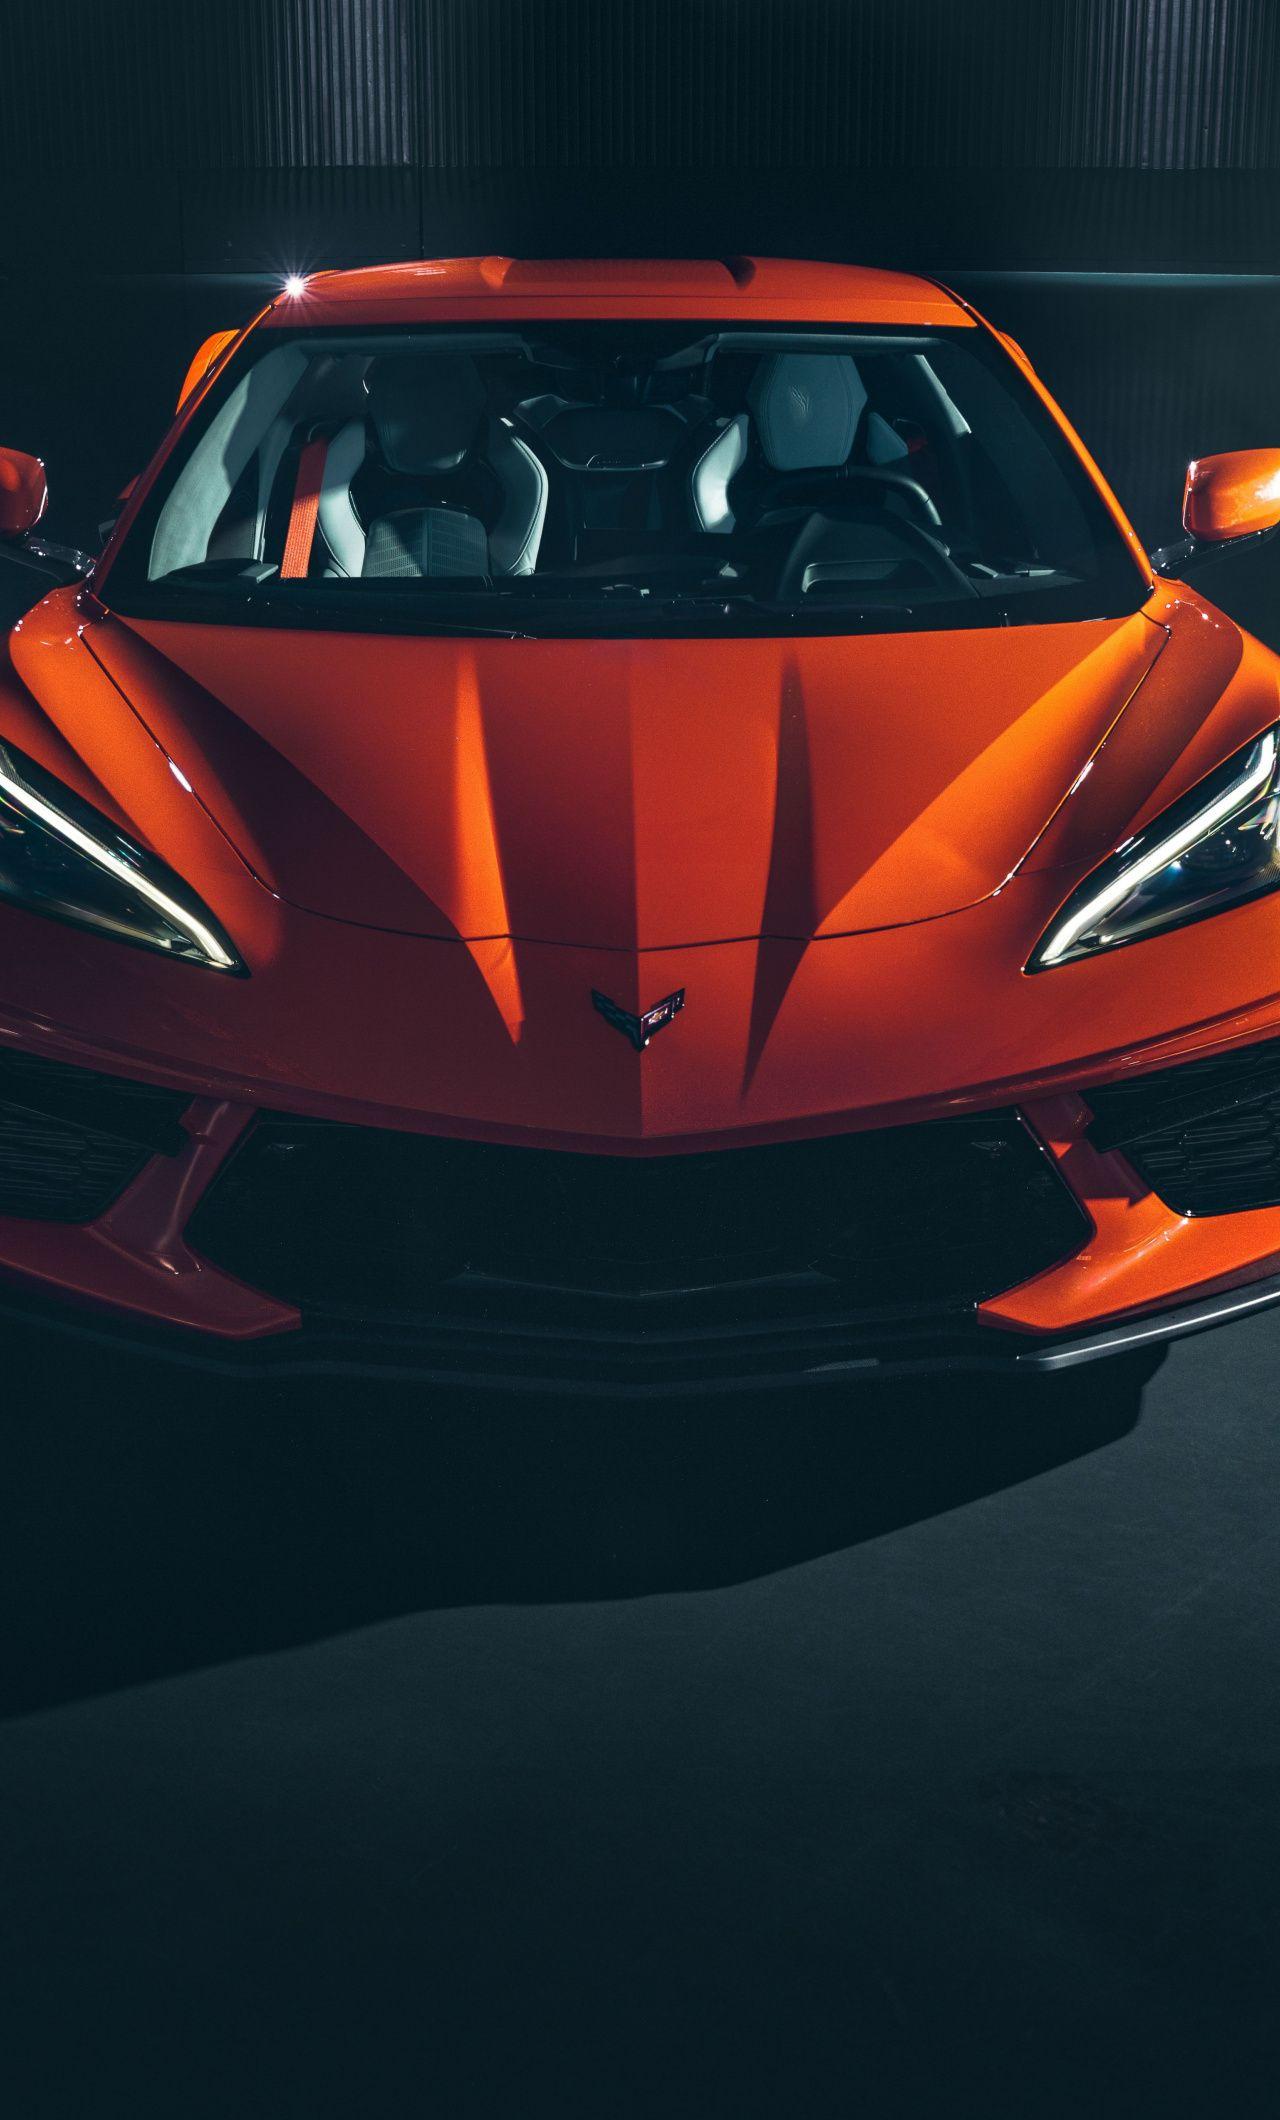 2020 Corvette Stingray Wallpaper - Zendha